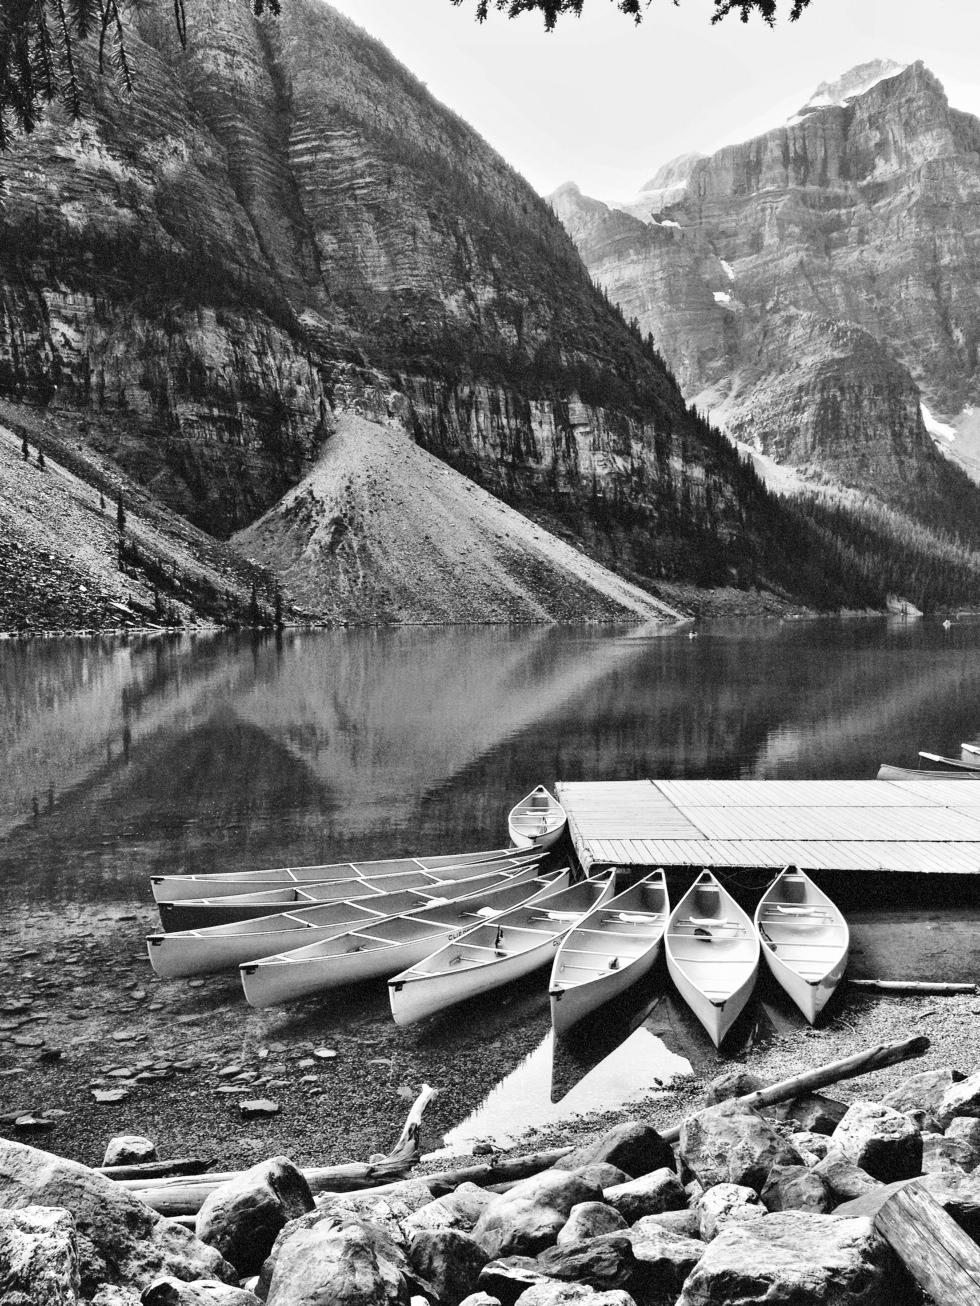 Lake Moraine, Banff National Park, Alberta, Canada   Purchase